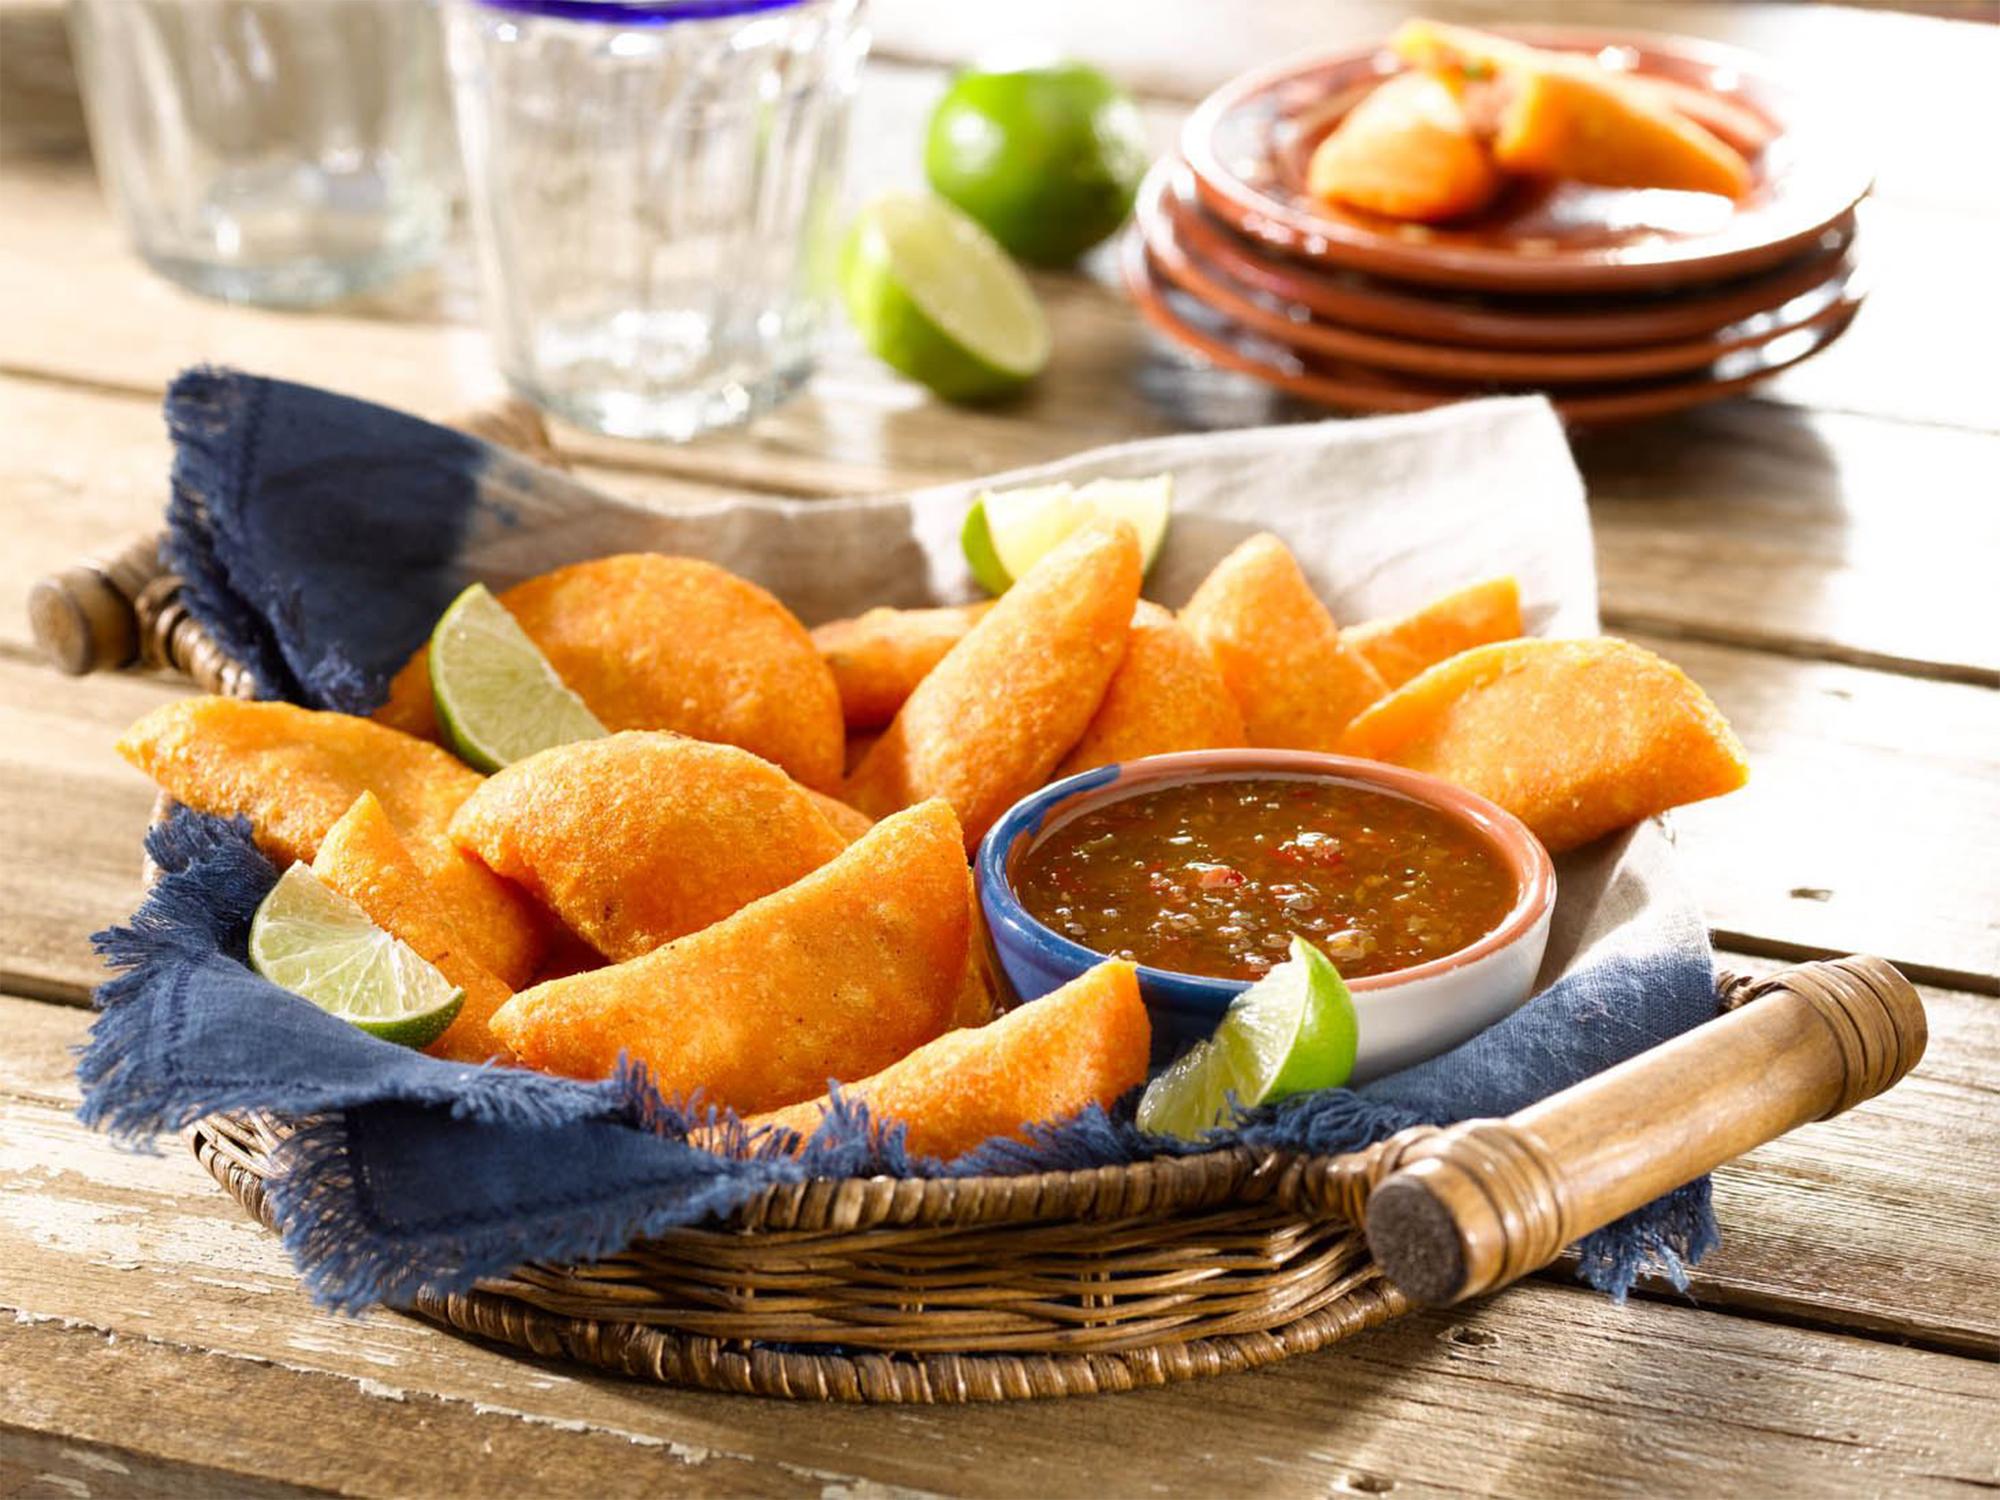 Image credits: Goya foods